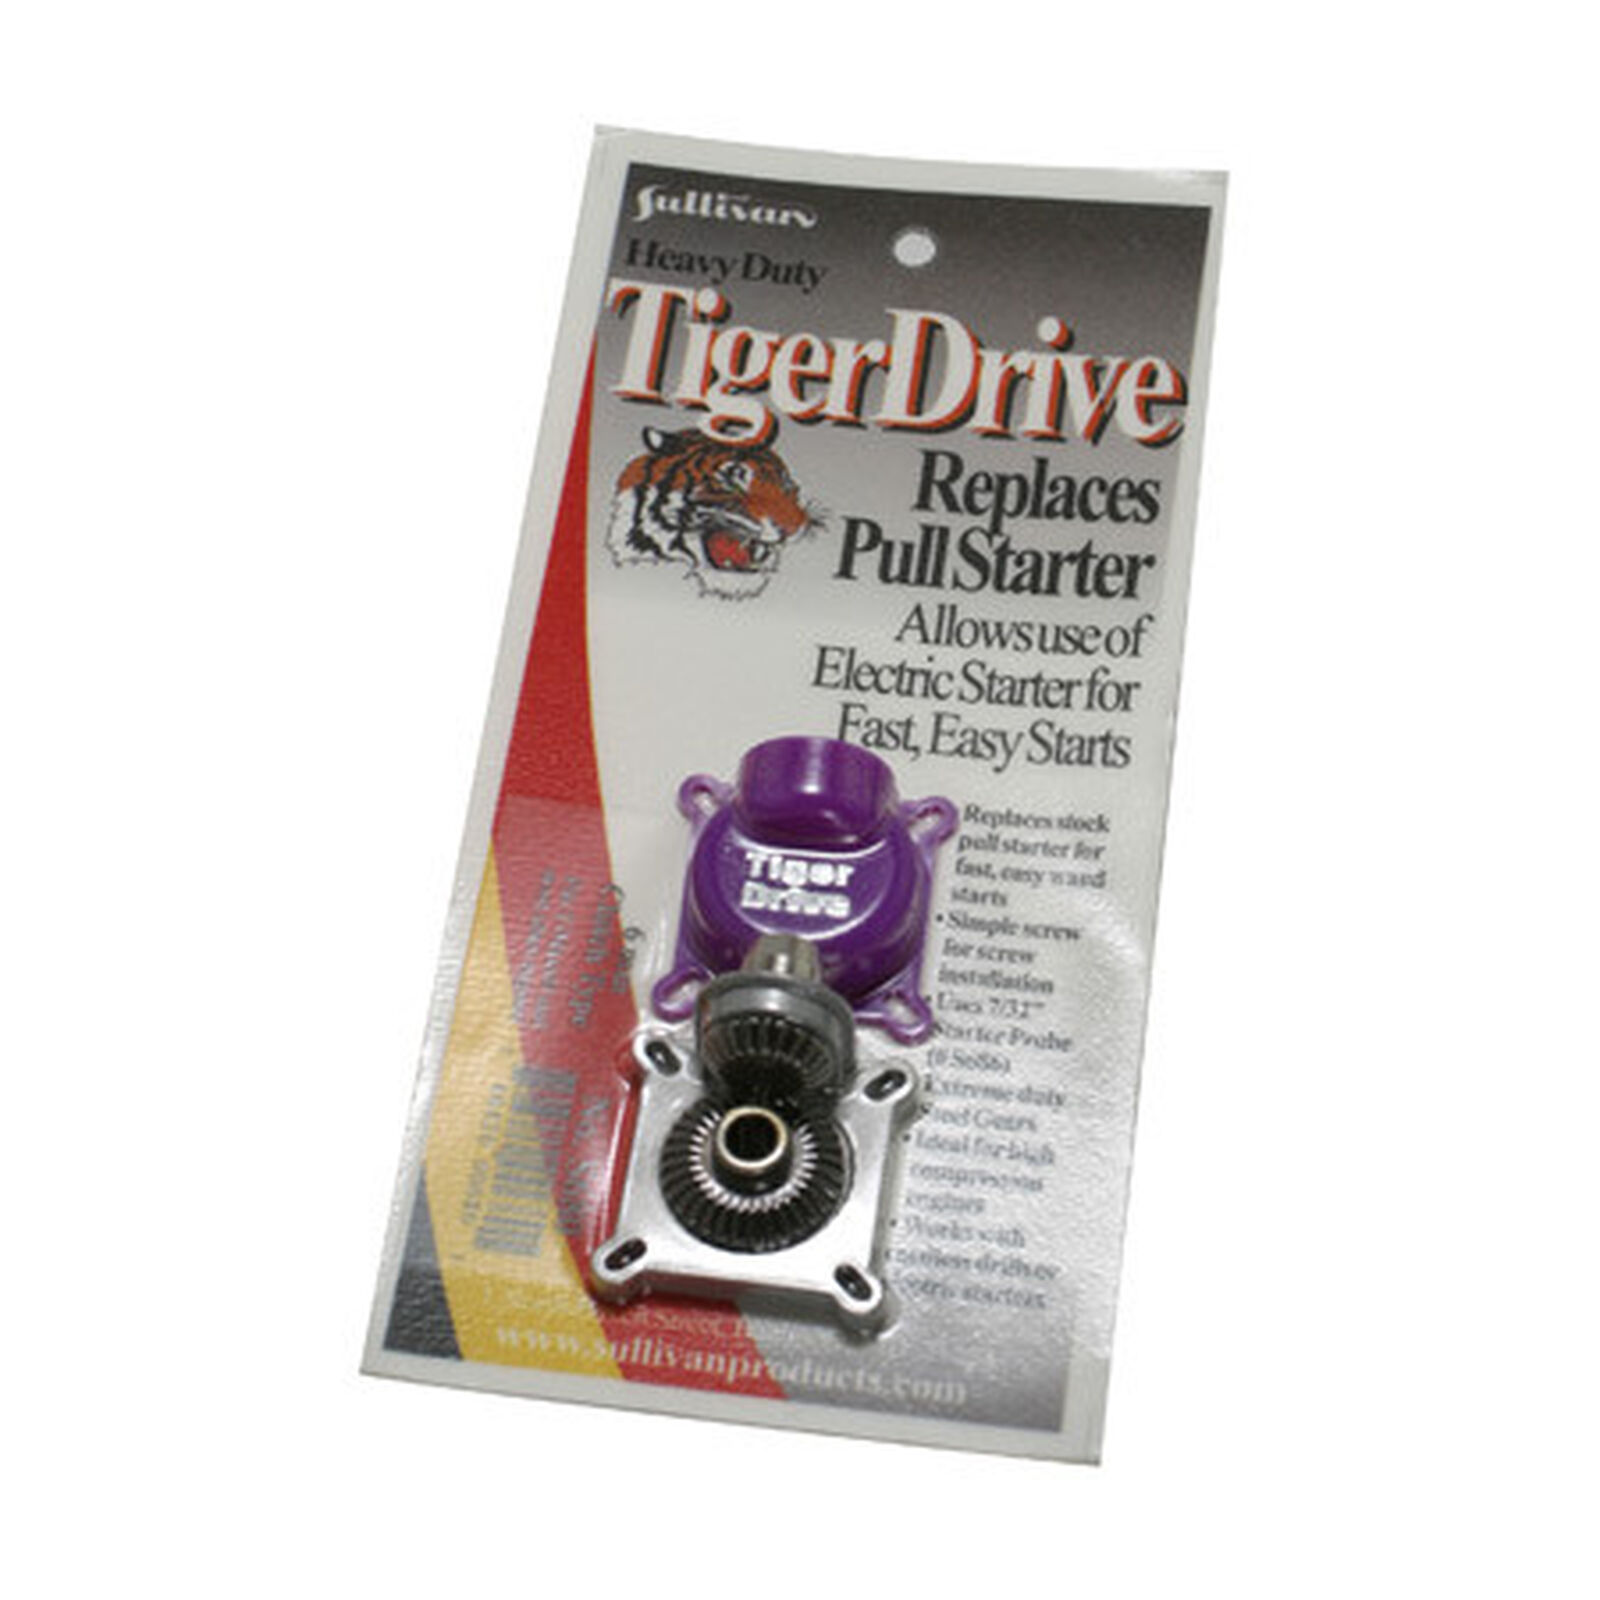 TigerDrive Clutch Version, 6mm Rear Output Shaft